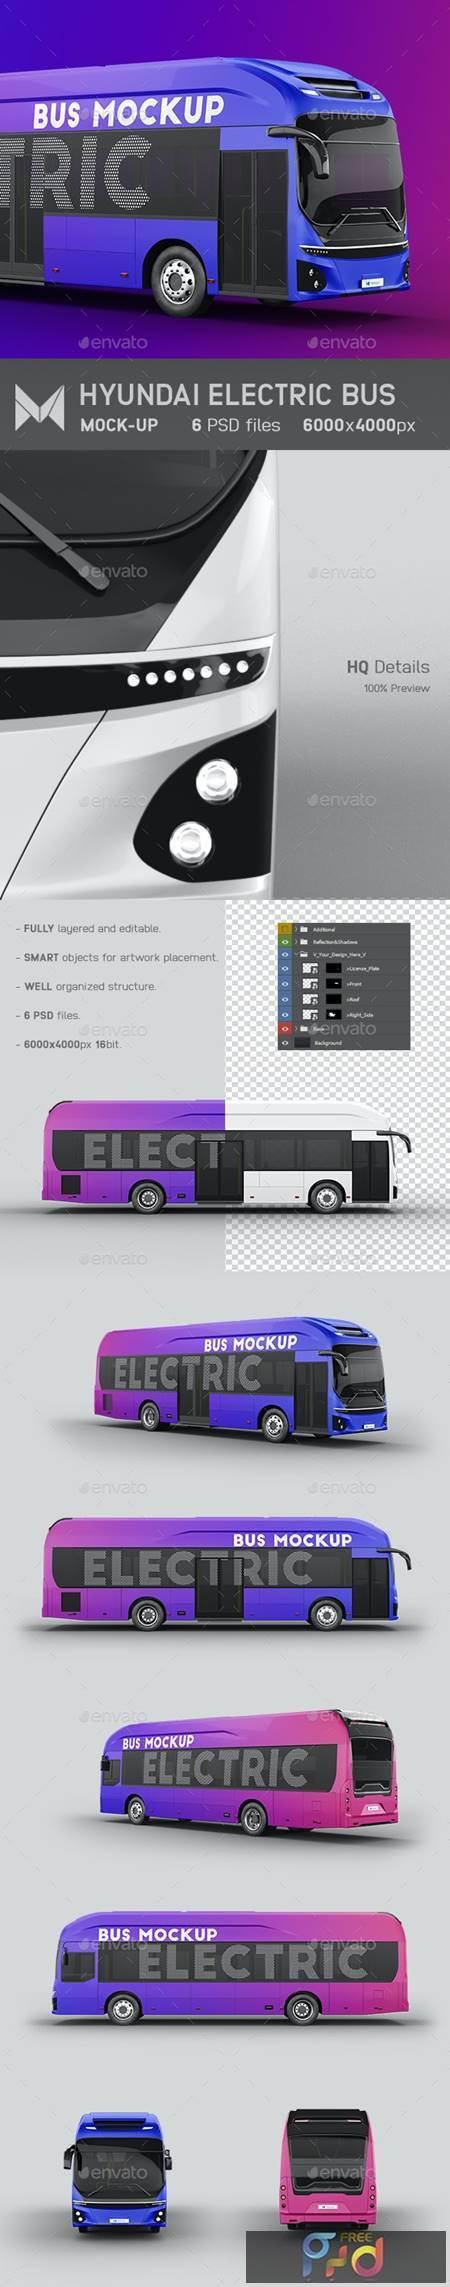 Hyundai Electric City Bus Mockup 27476773 1